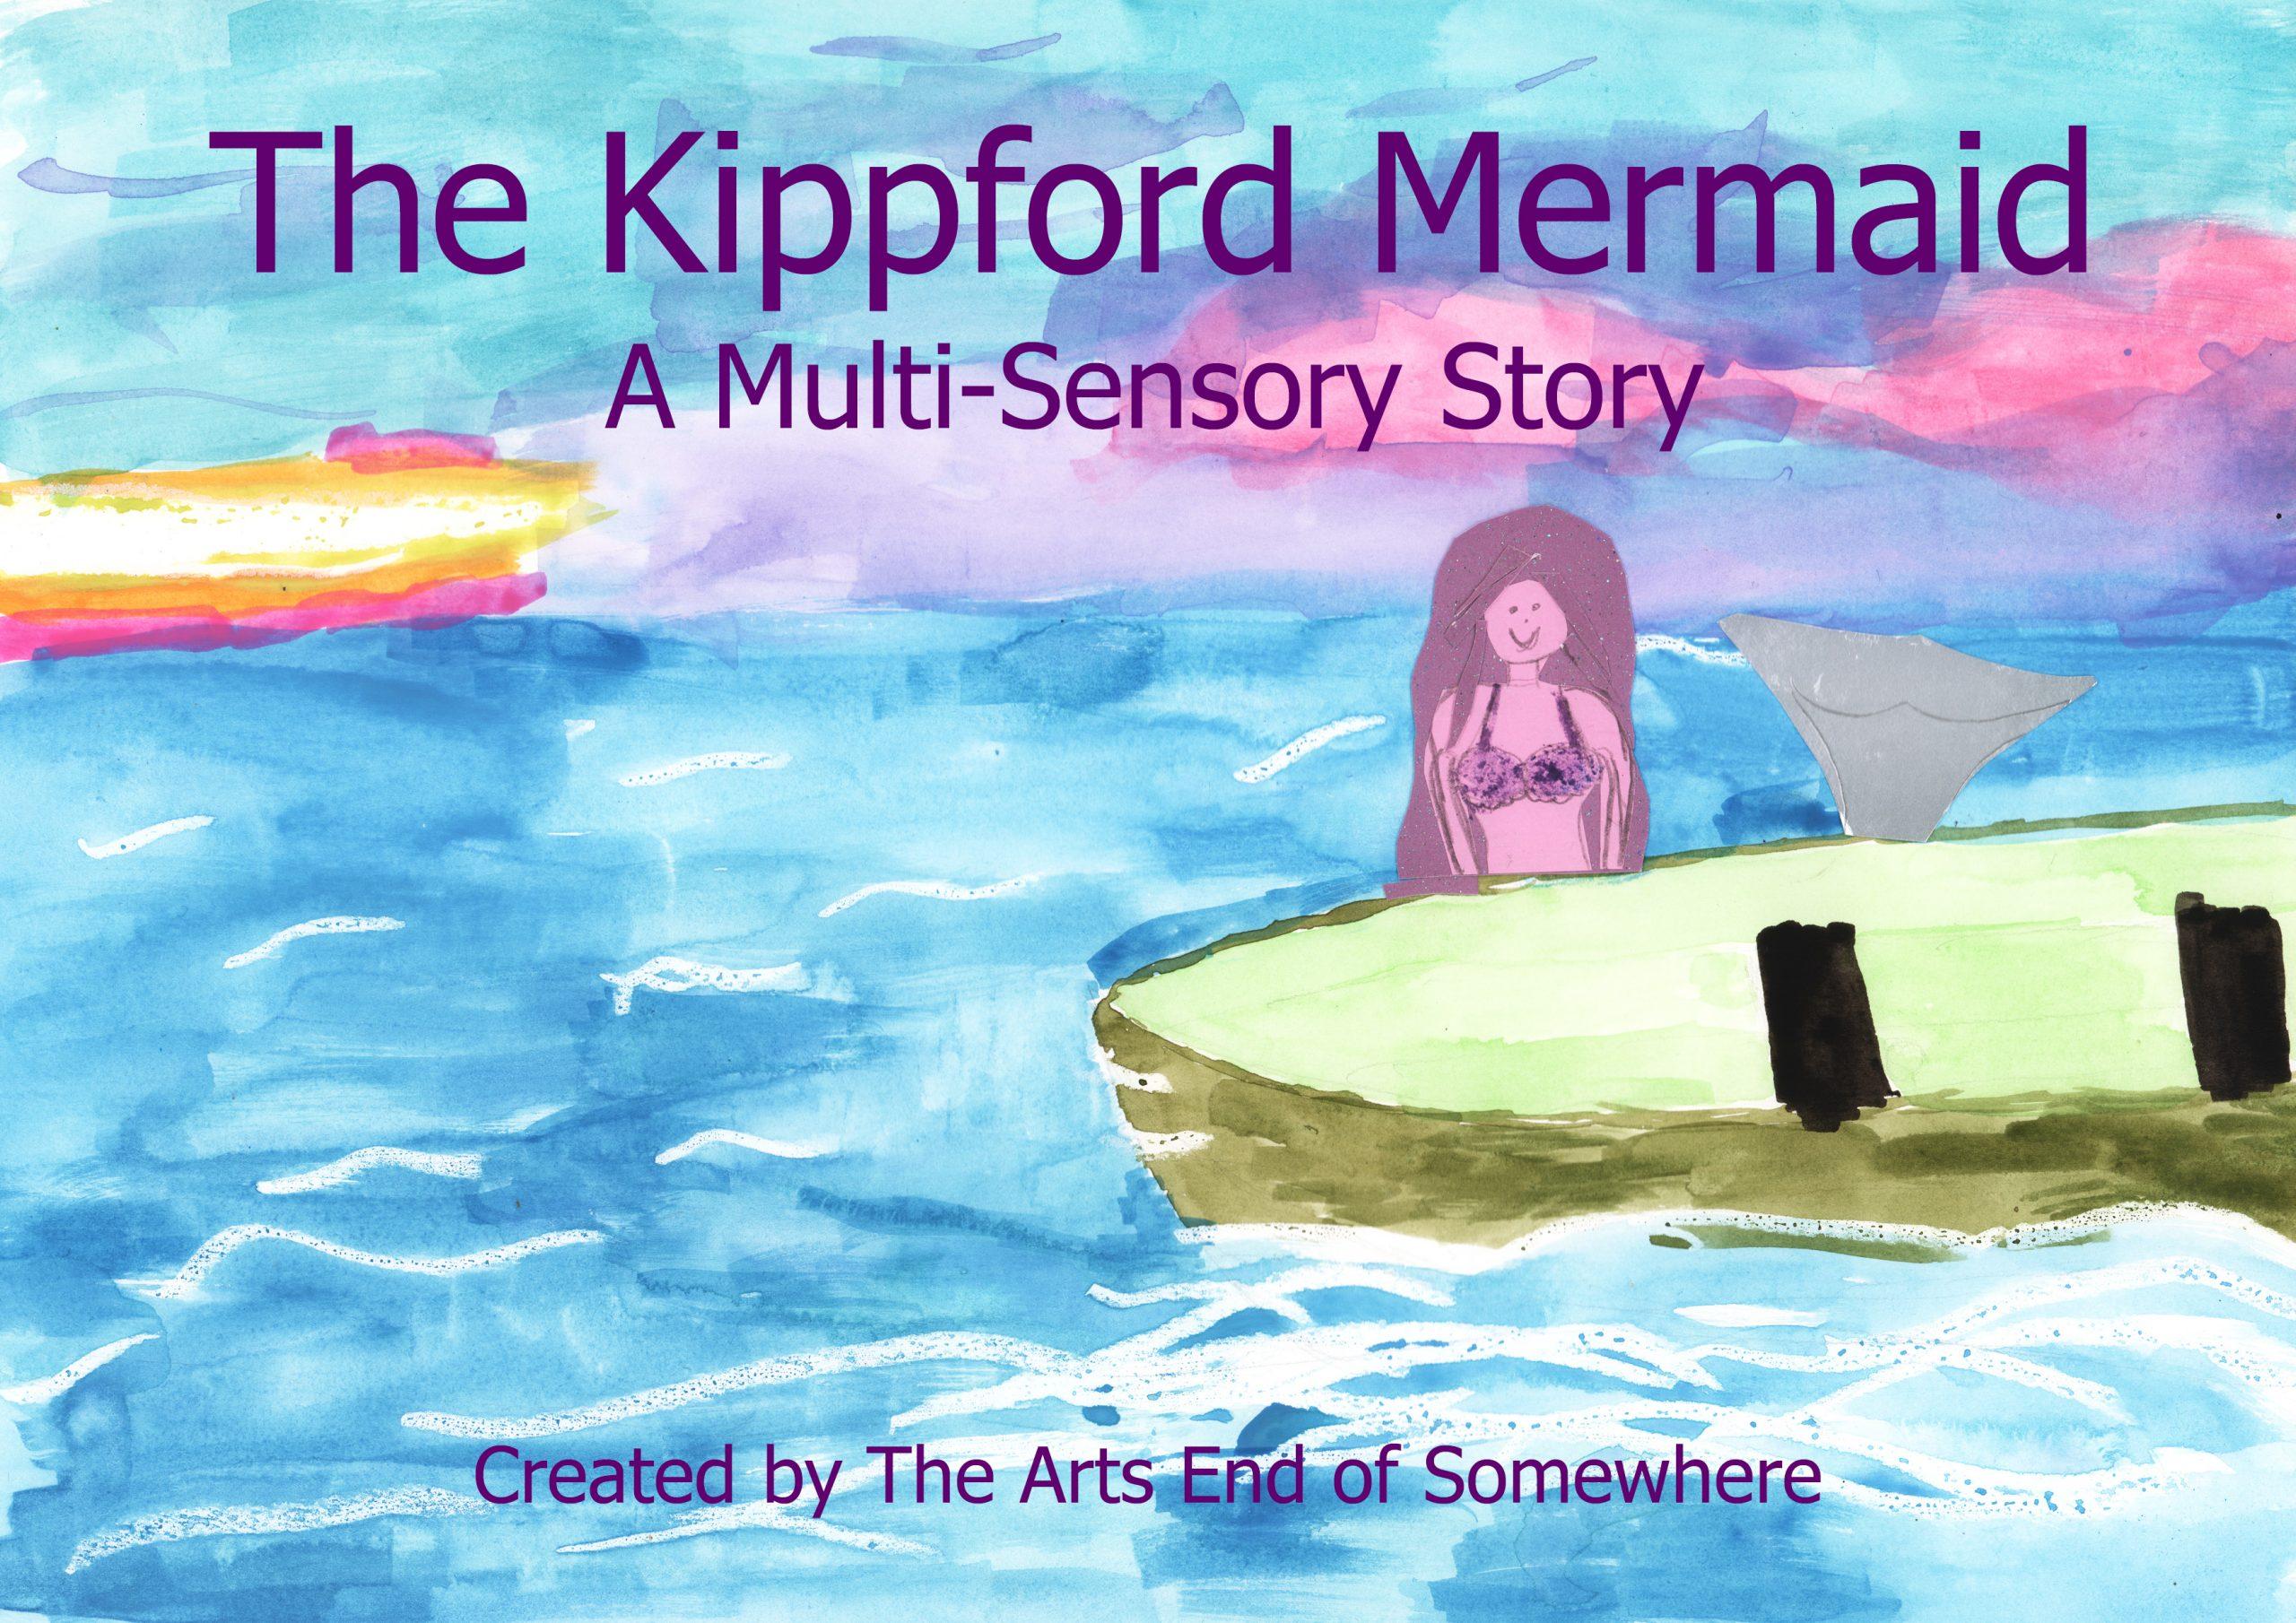 The Launch of the Kippford Mermaid